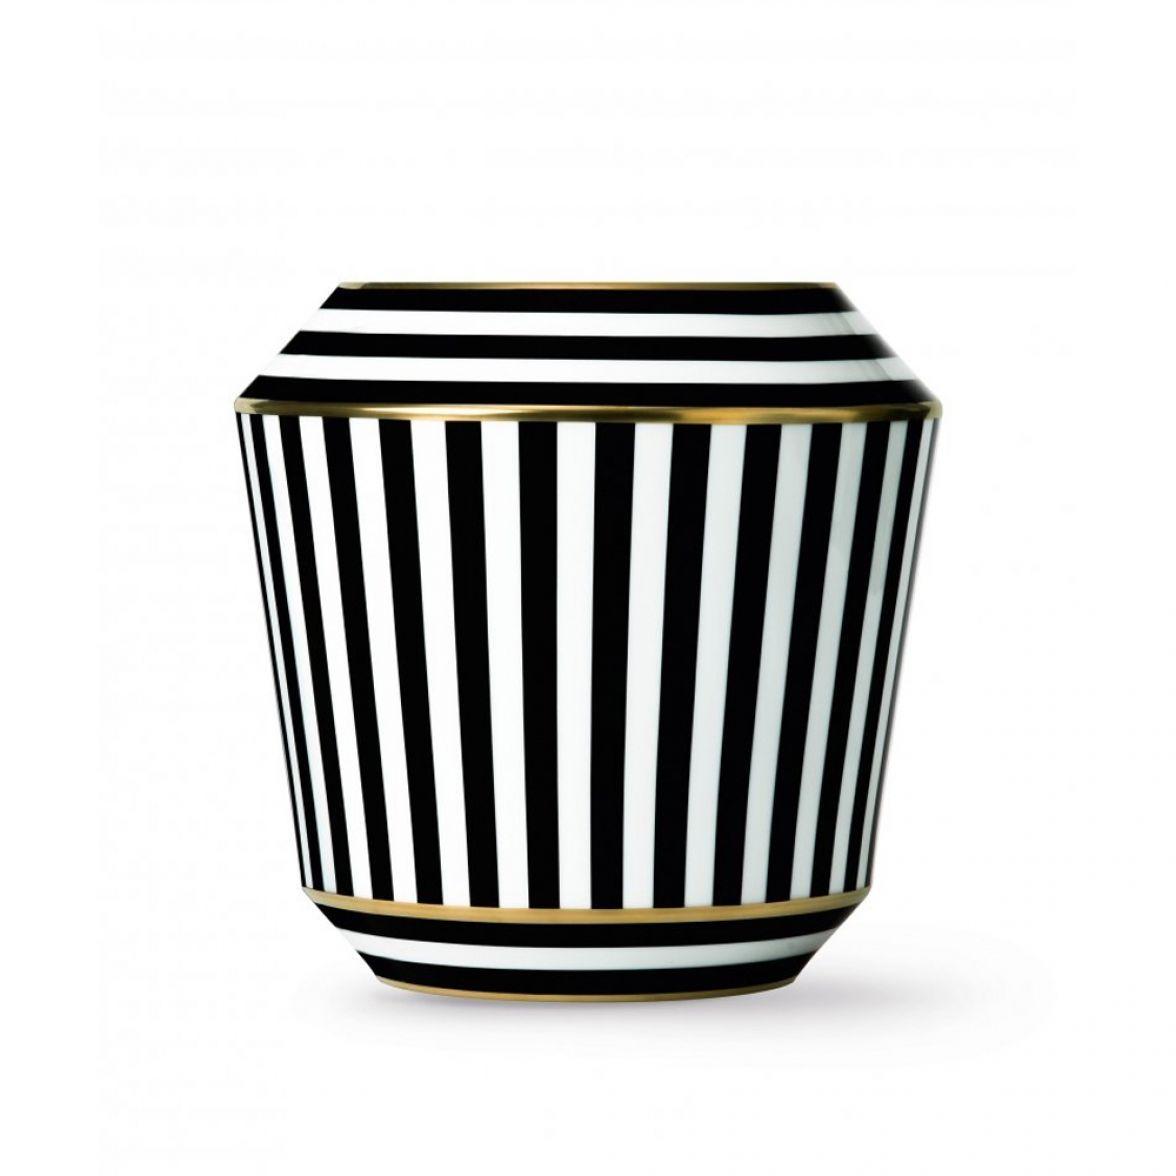 Luna Vase Sieger фото цена